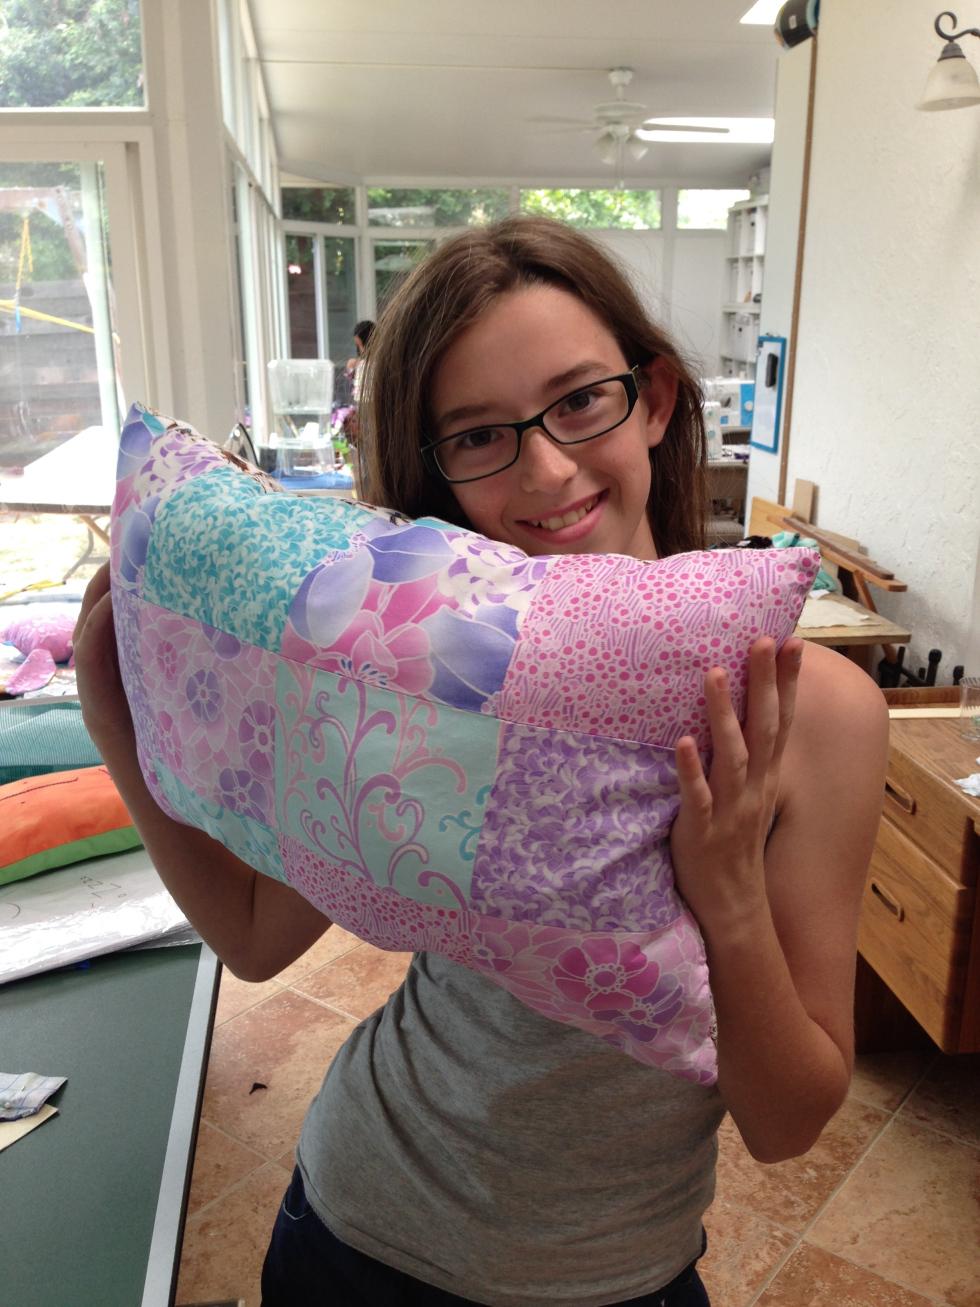 7th grader patchwork pillow